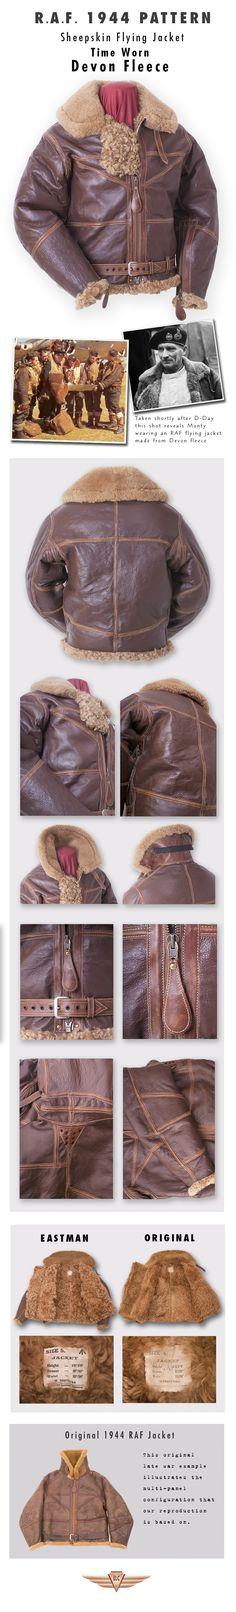 Eastman Leather Clothing - British Flight Jackets : Raf1944